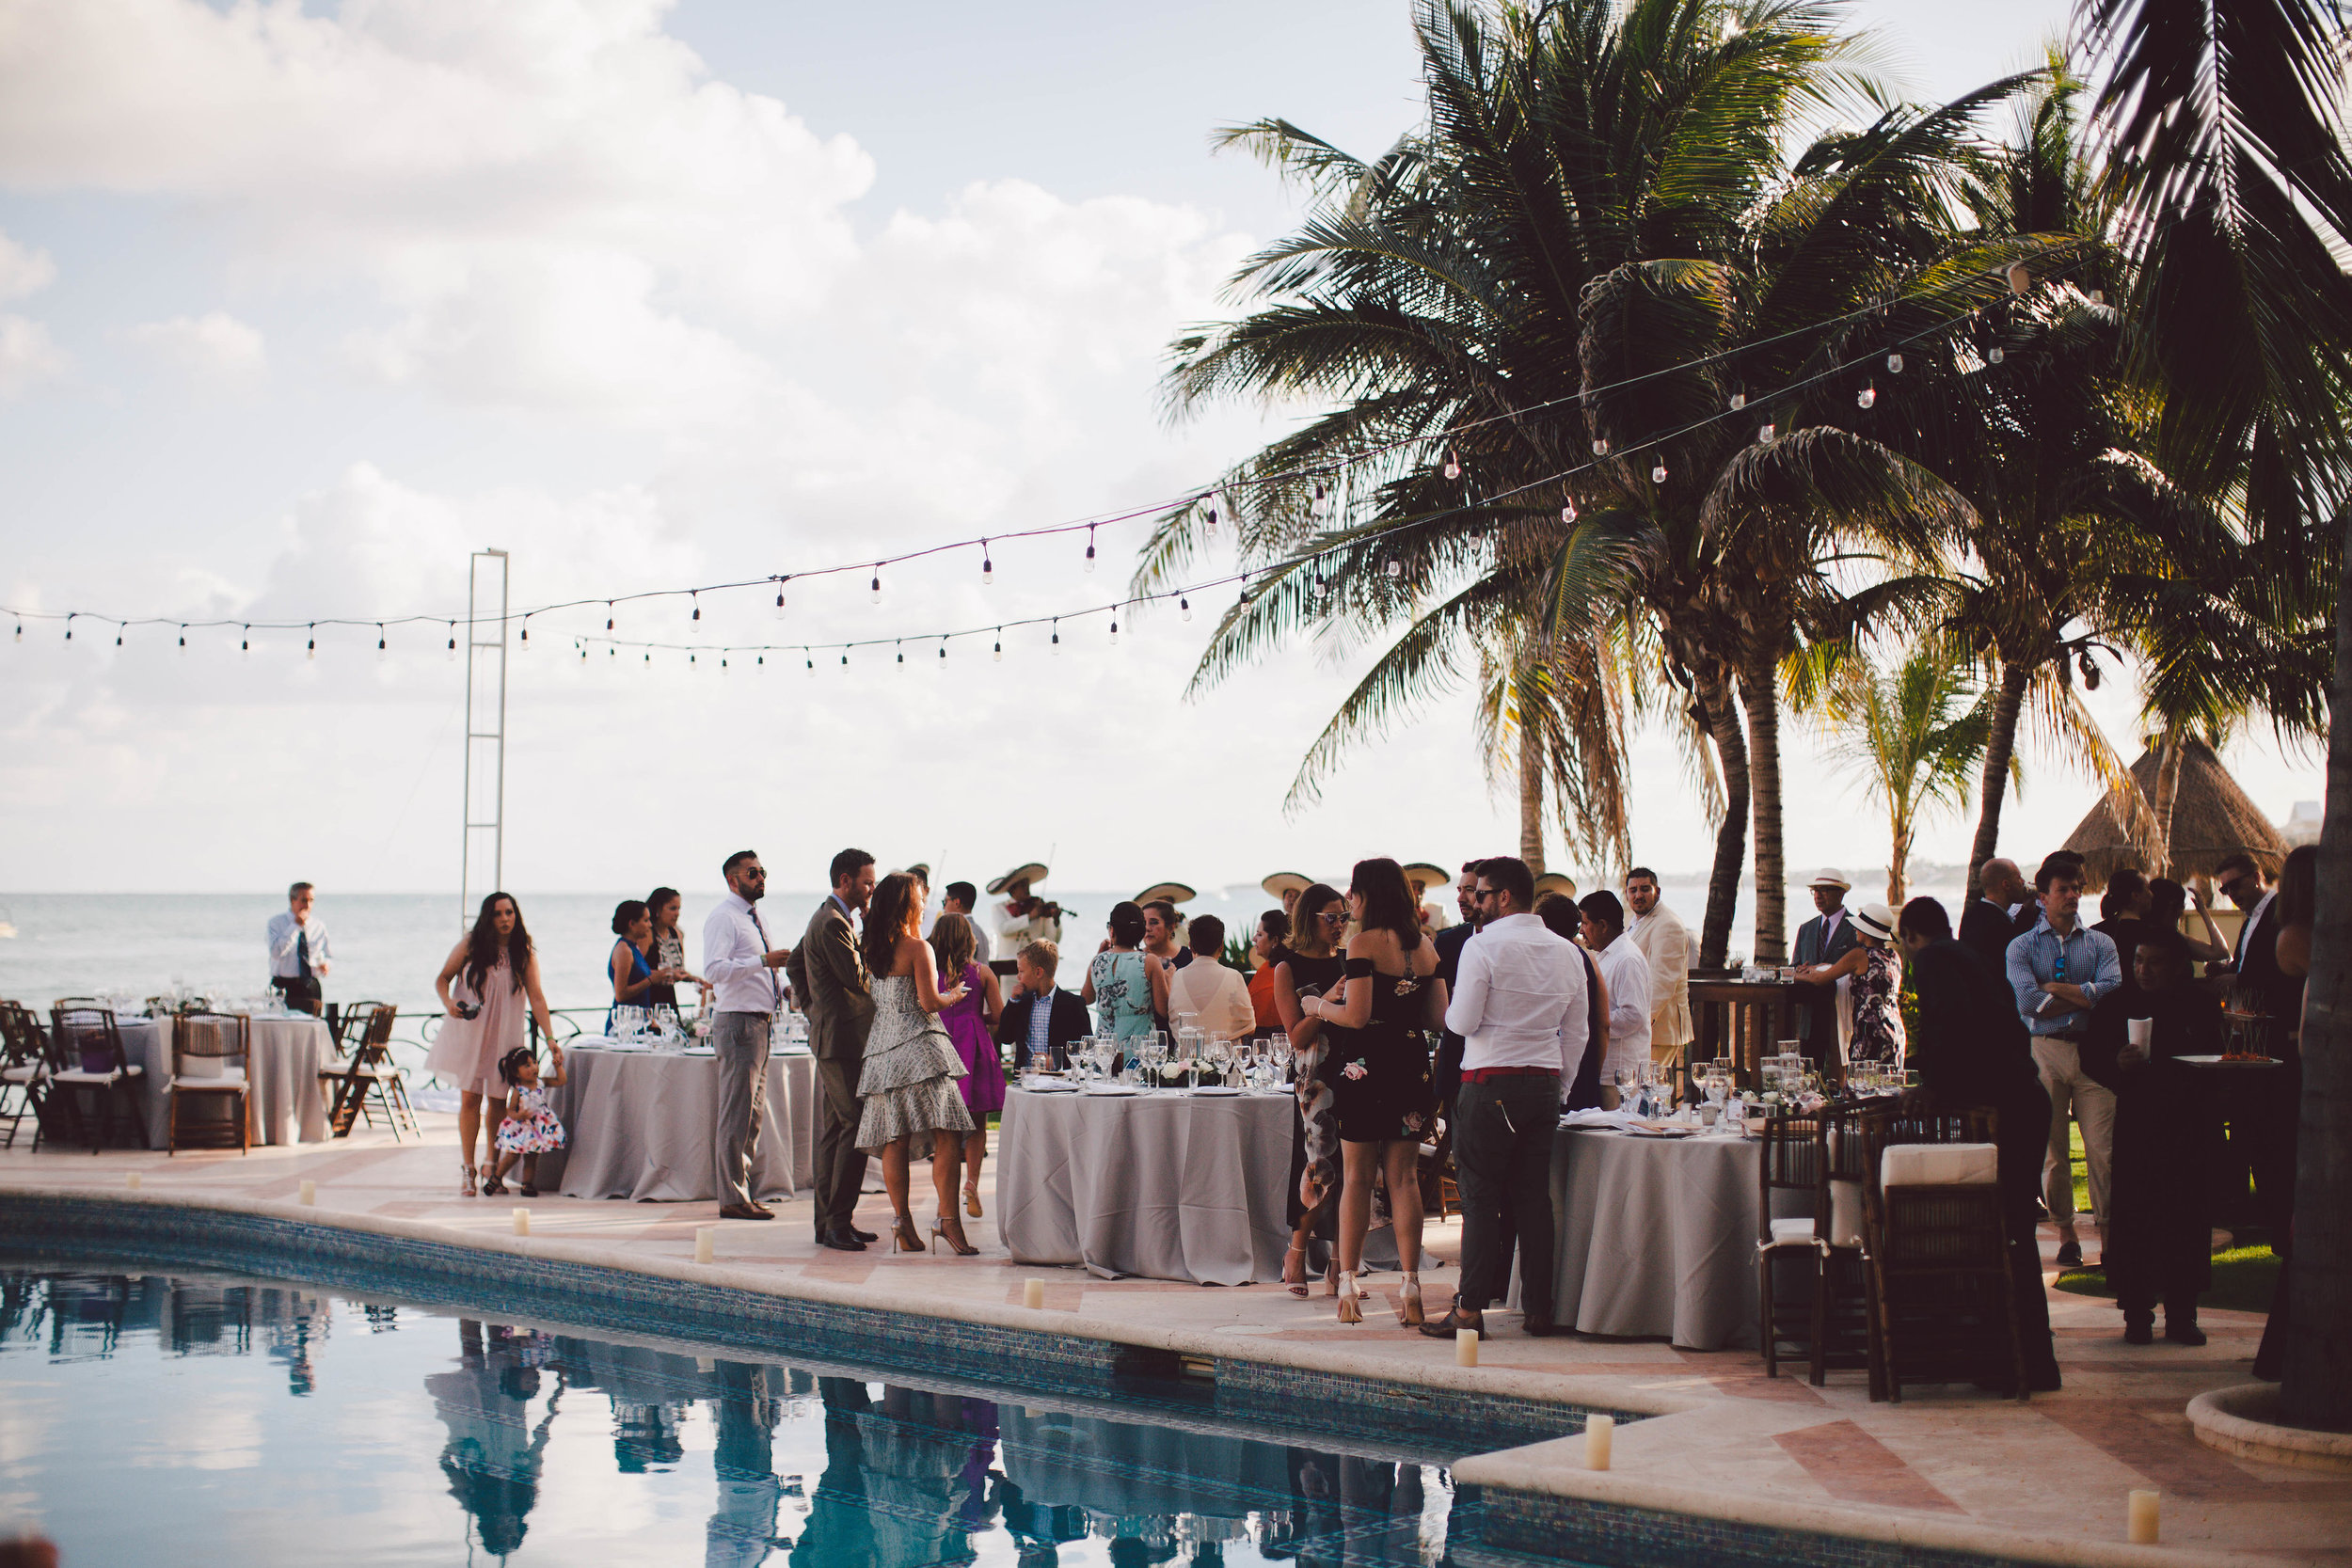 mexico_wedding_cancun_villa_la_joya_evangeline_lane_086.jpg